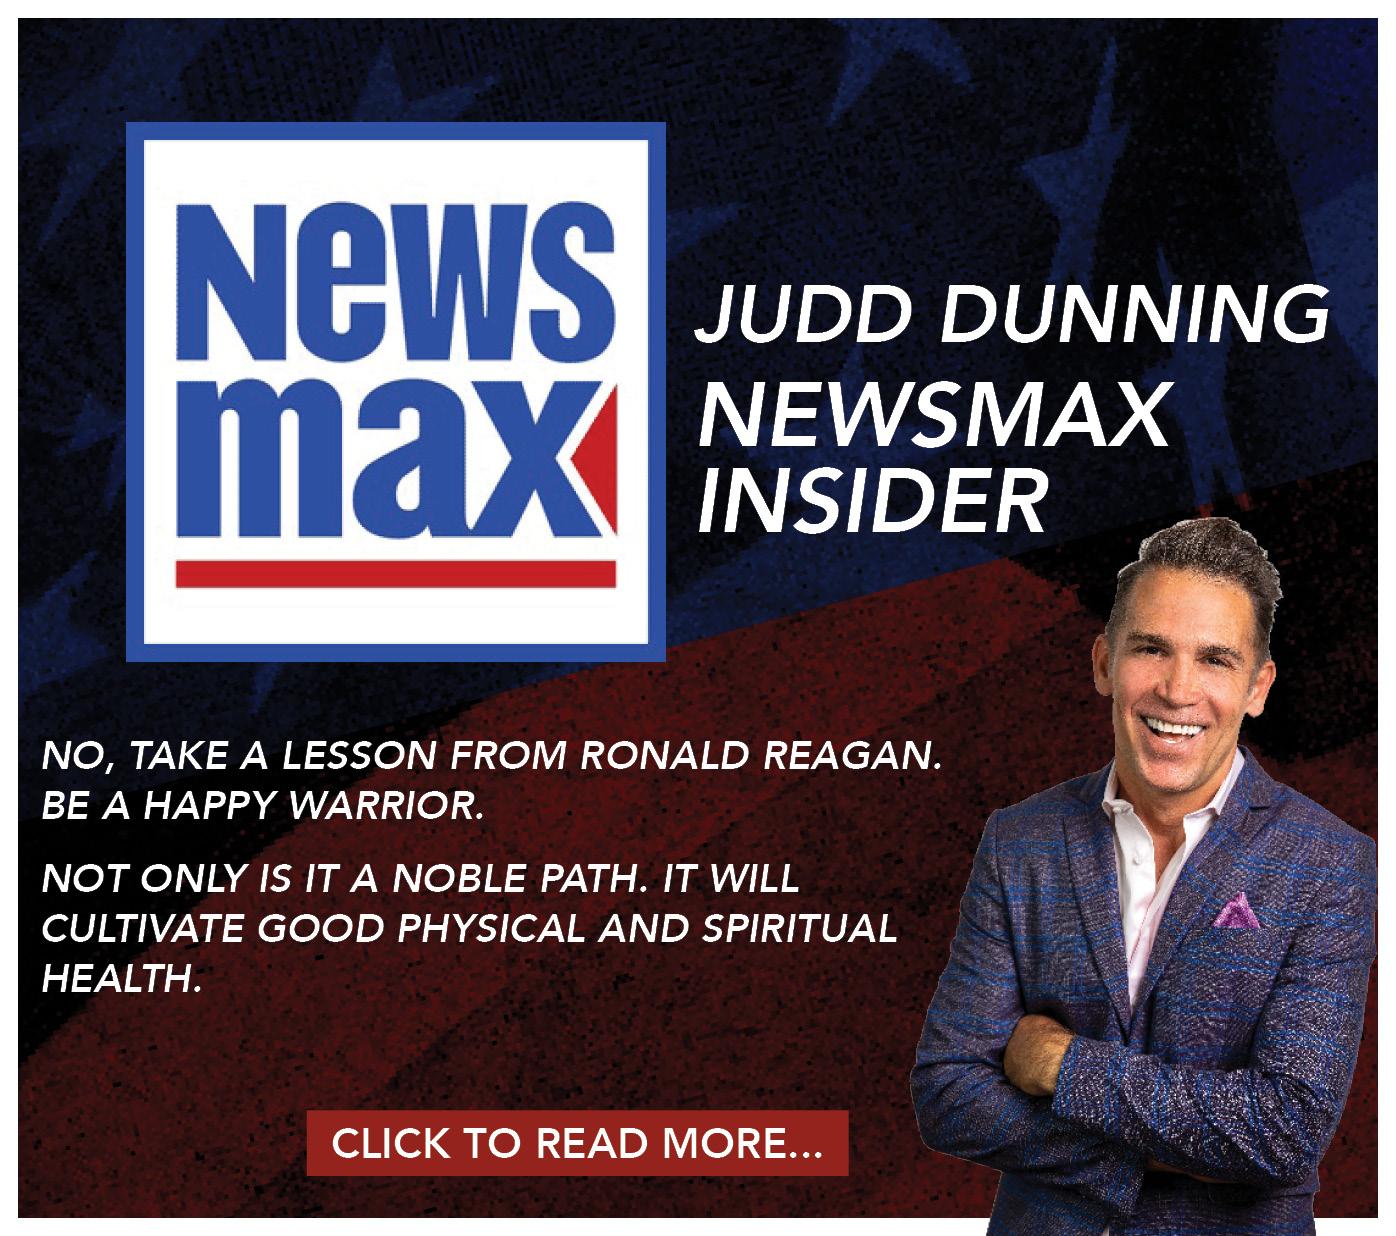 NewsmaxInsider.jpg